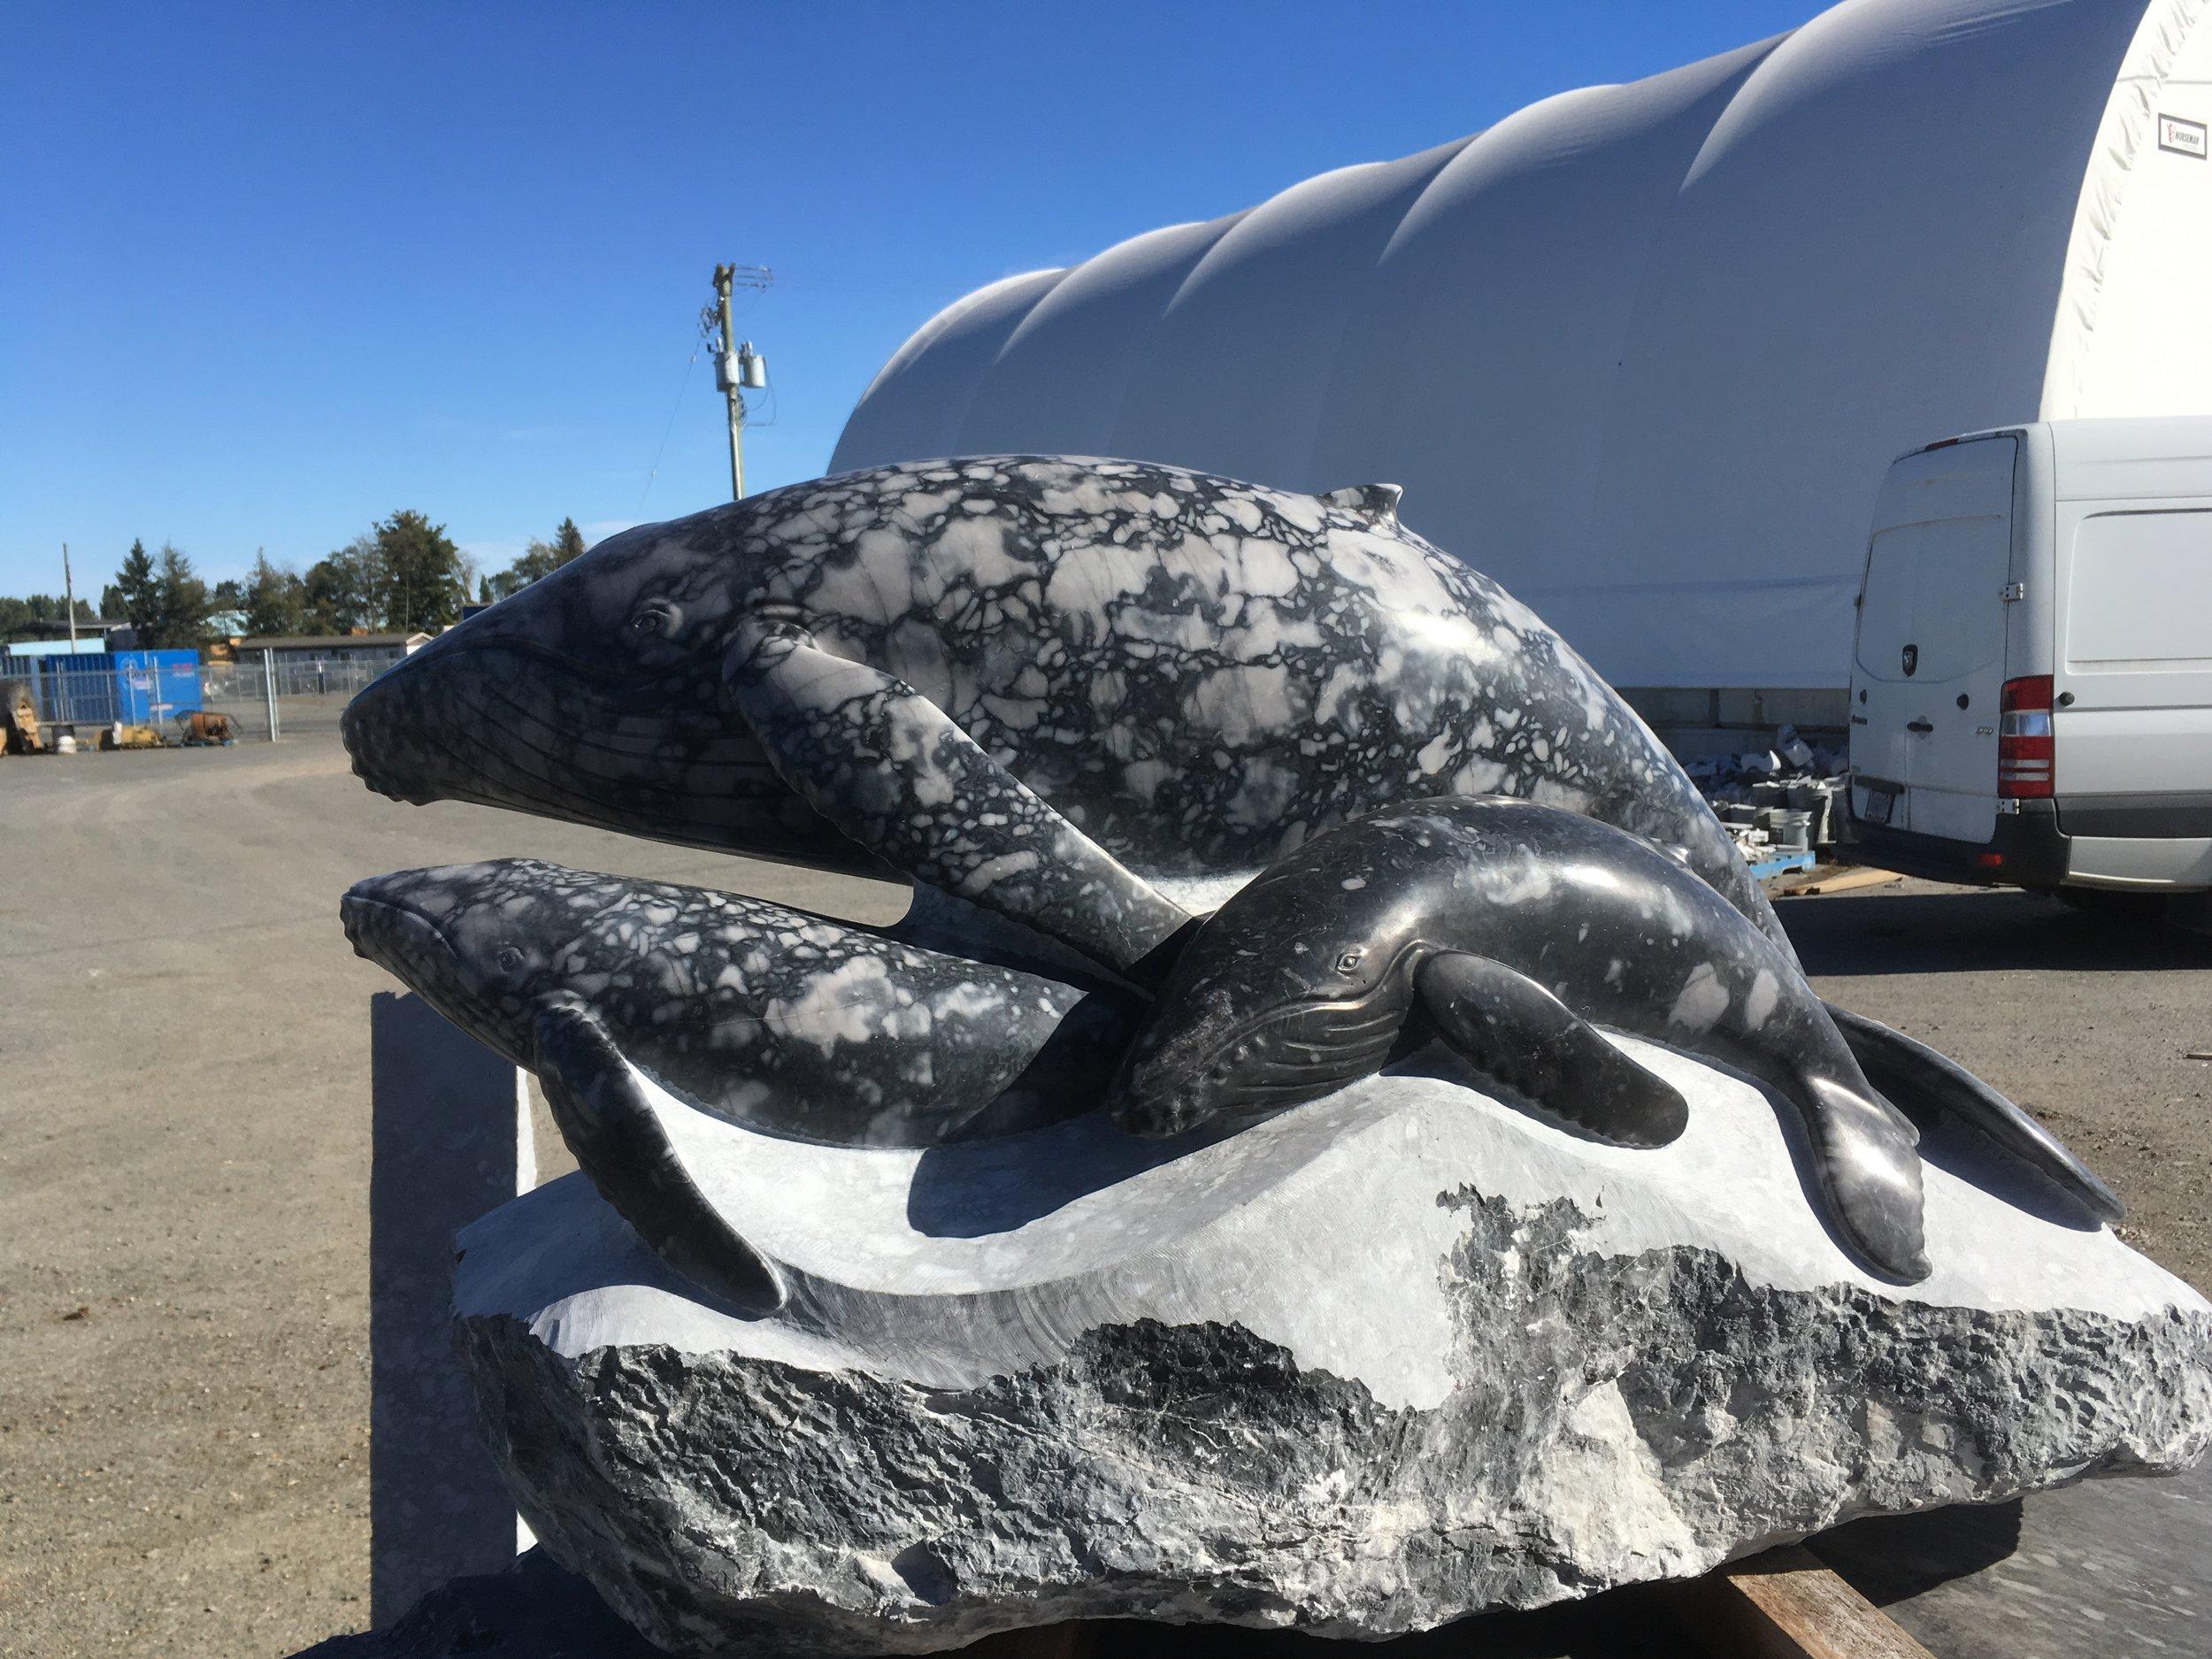 Wild Humback Whales